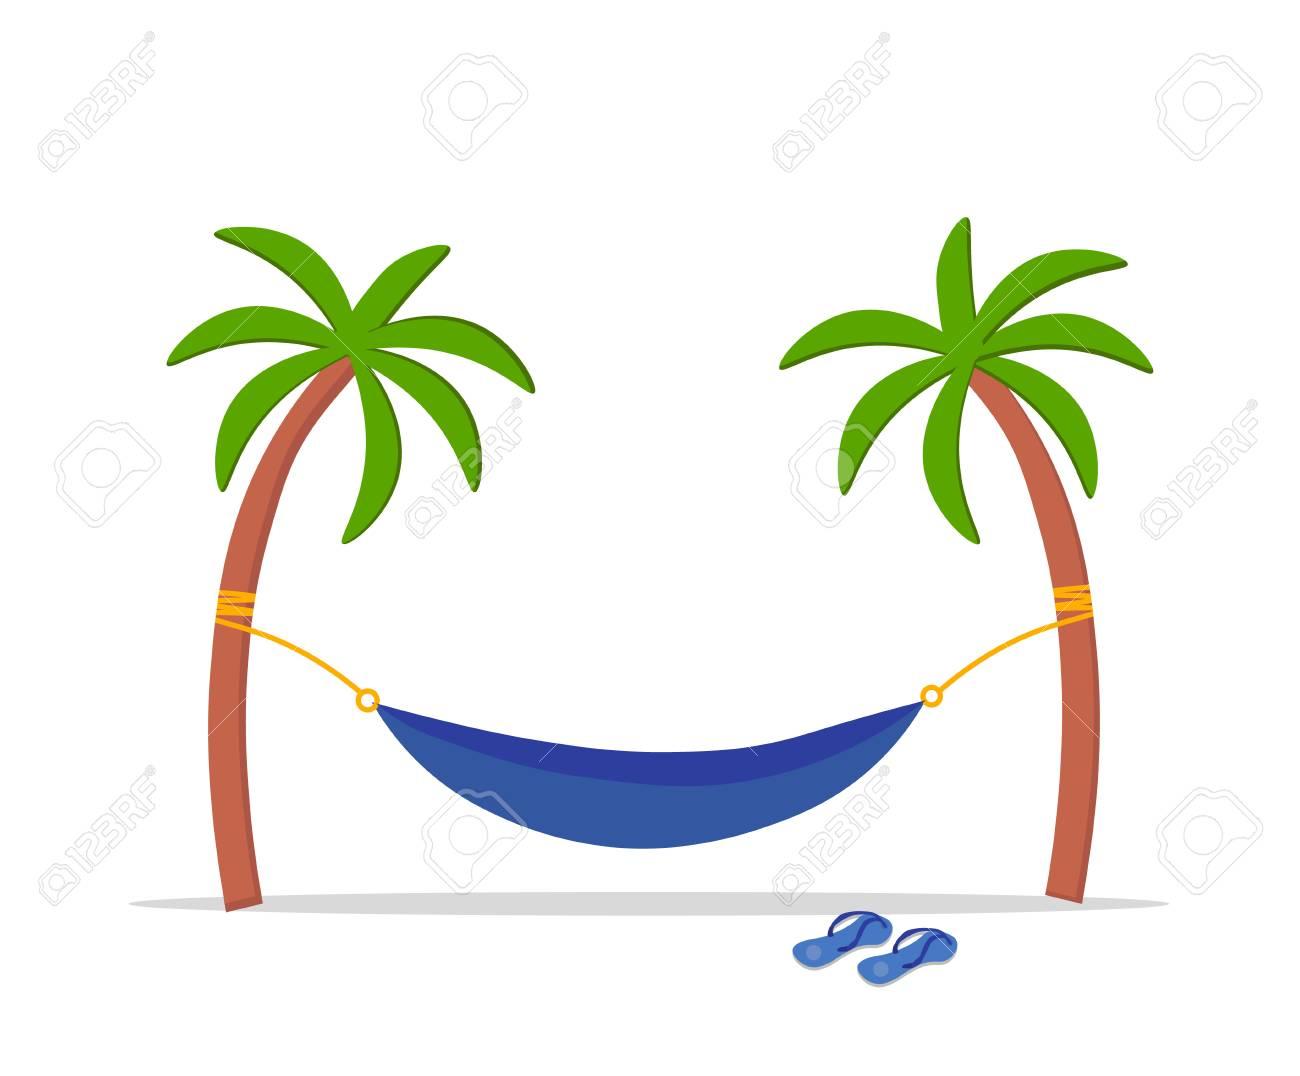 Hammock clipart summer. Free holiday download clip